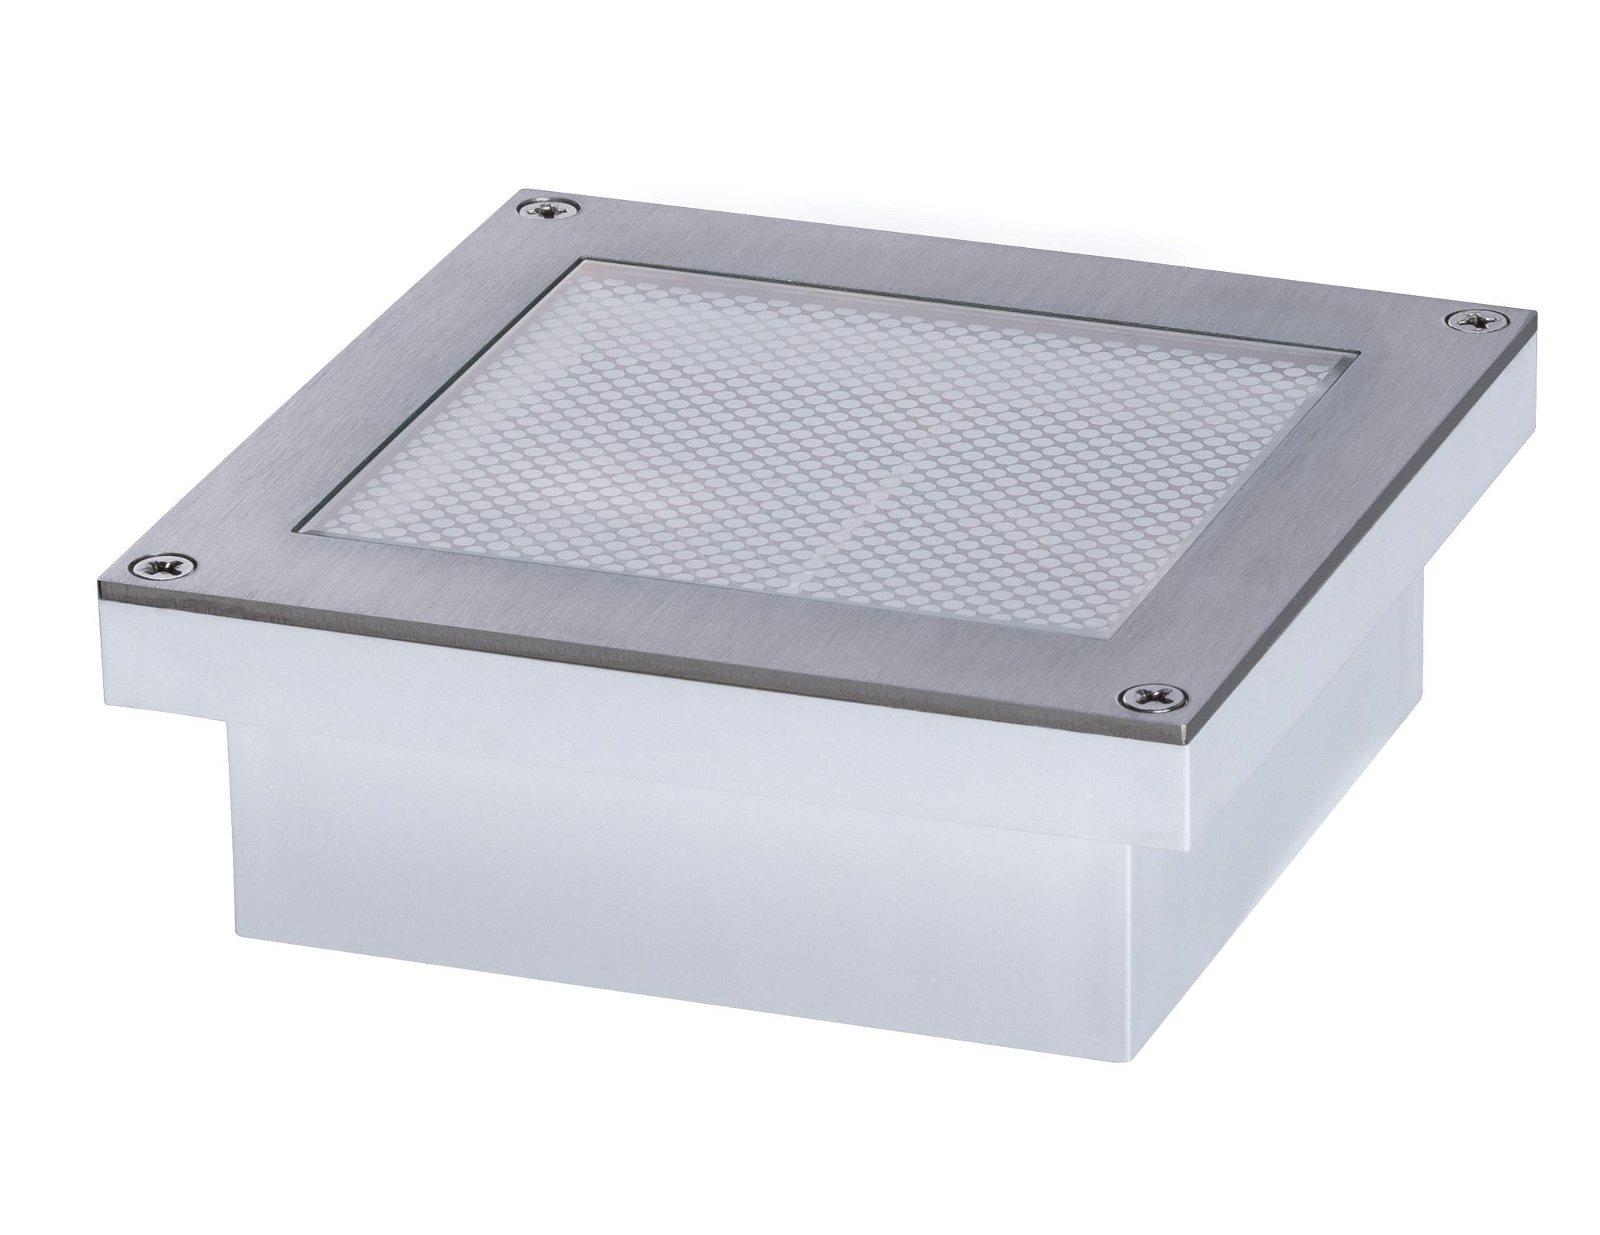 LED Bodeneinbauleuchte Brick Warmweiß IP67 100x100mm 3000K 0,8W 80lm 230V Alu/Grau Metall/Edelstahl